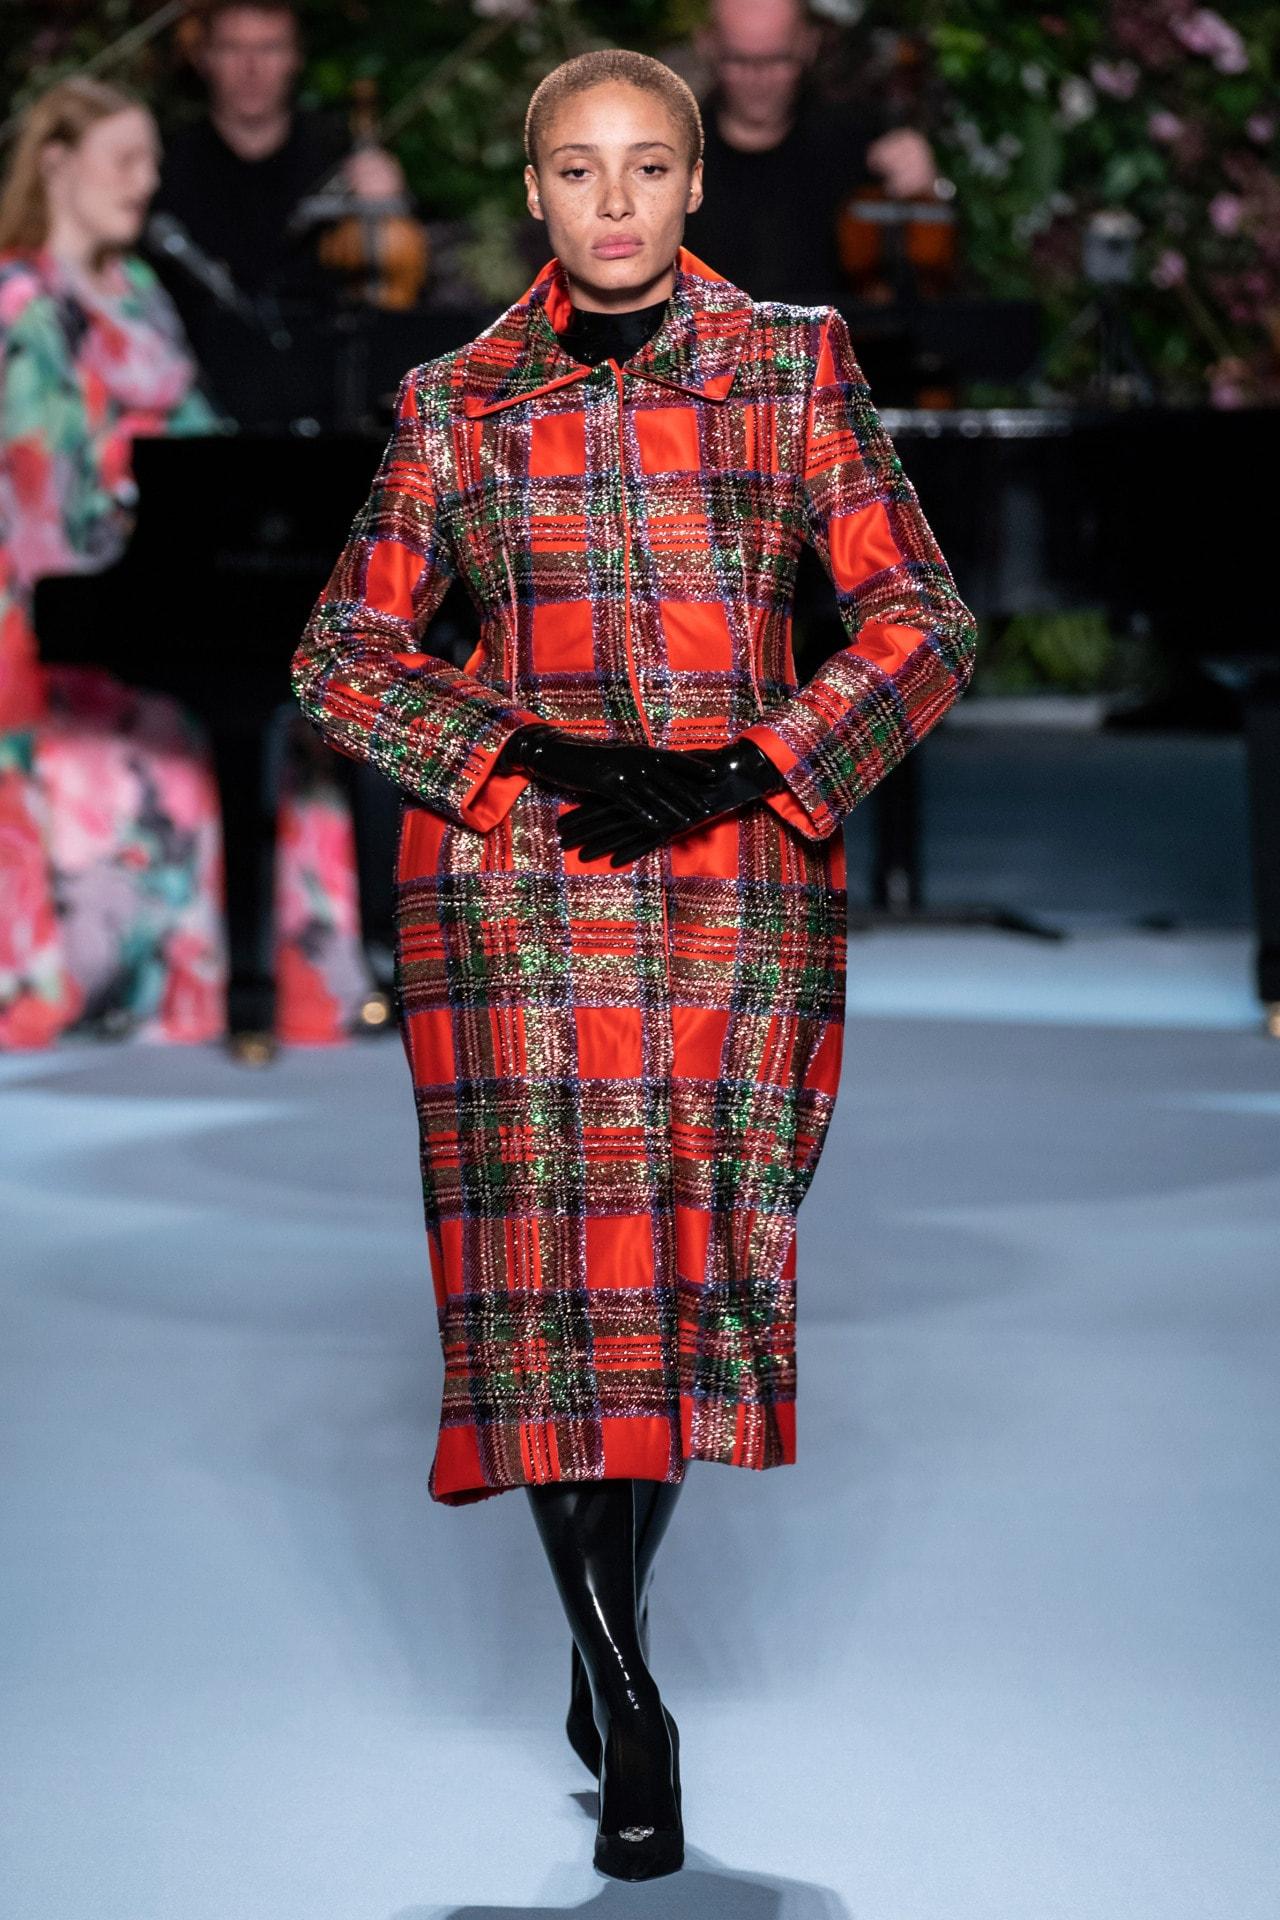 Richard Quinn ready-to-wear autumn/winter '19/'20